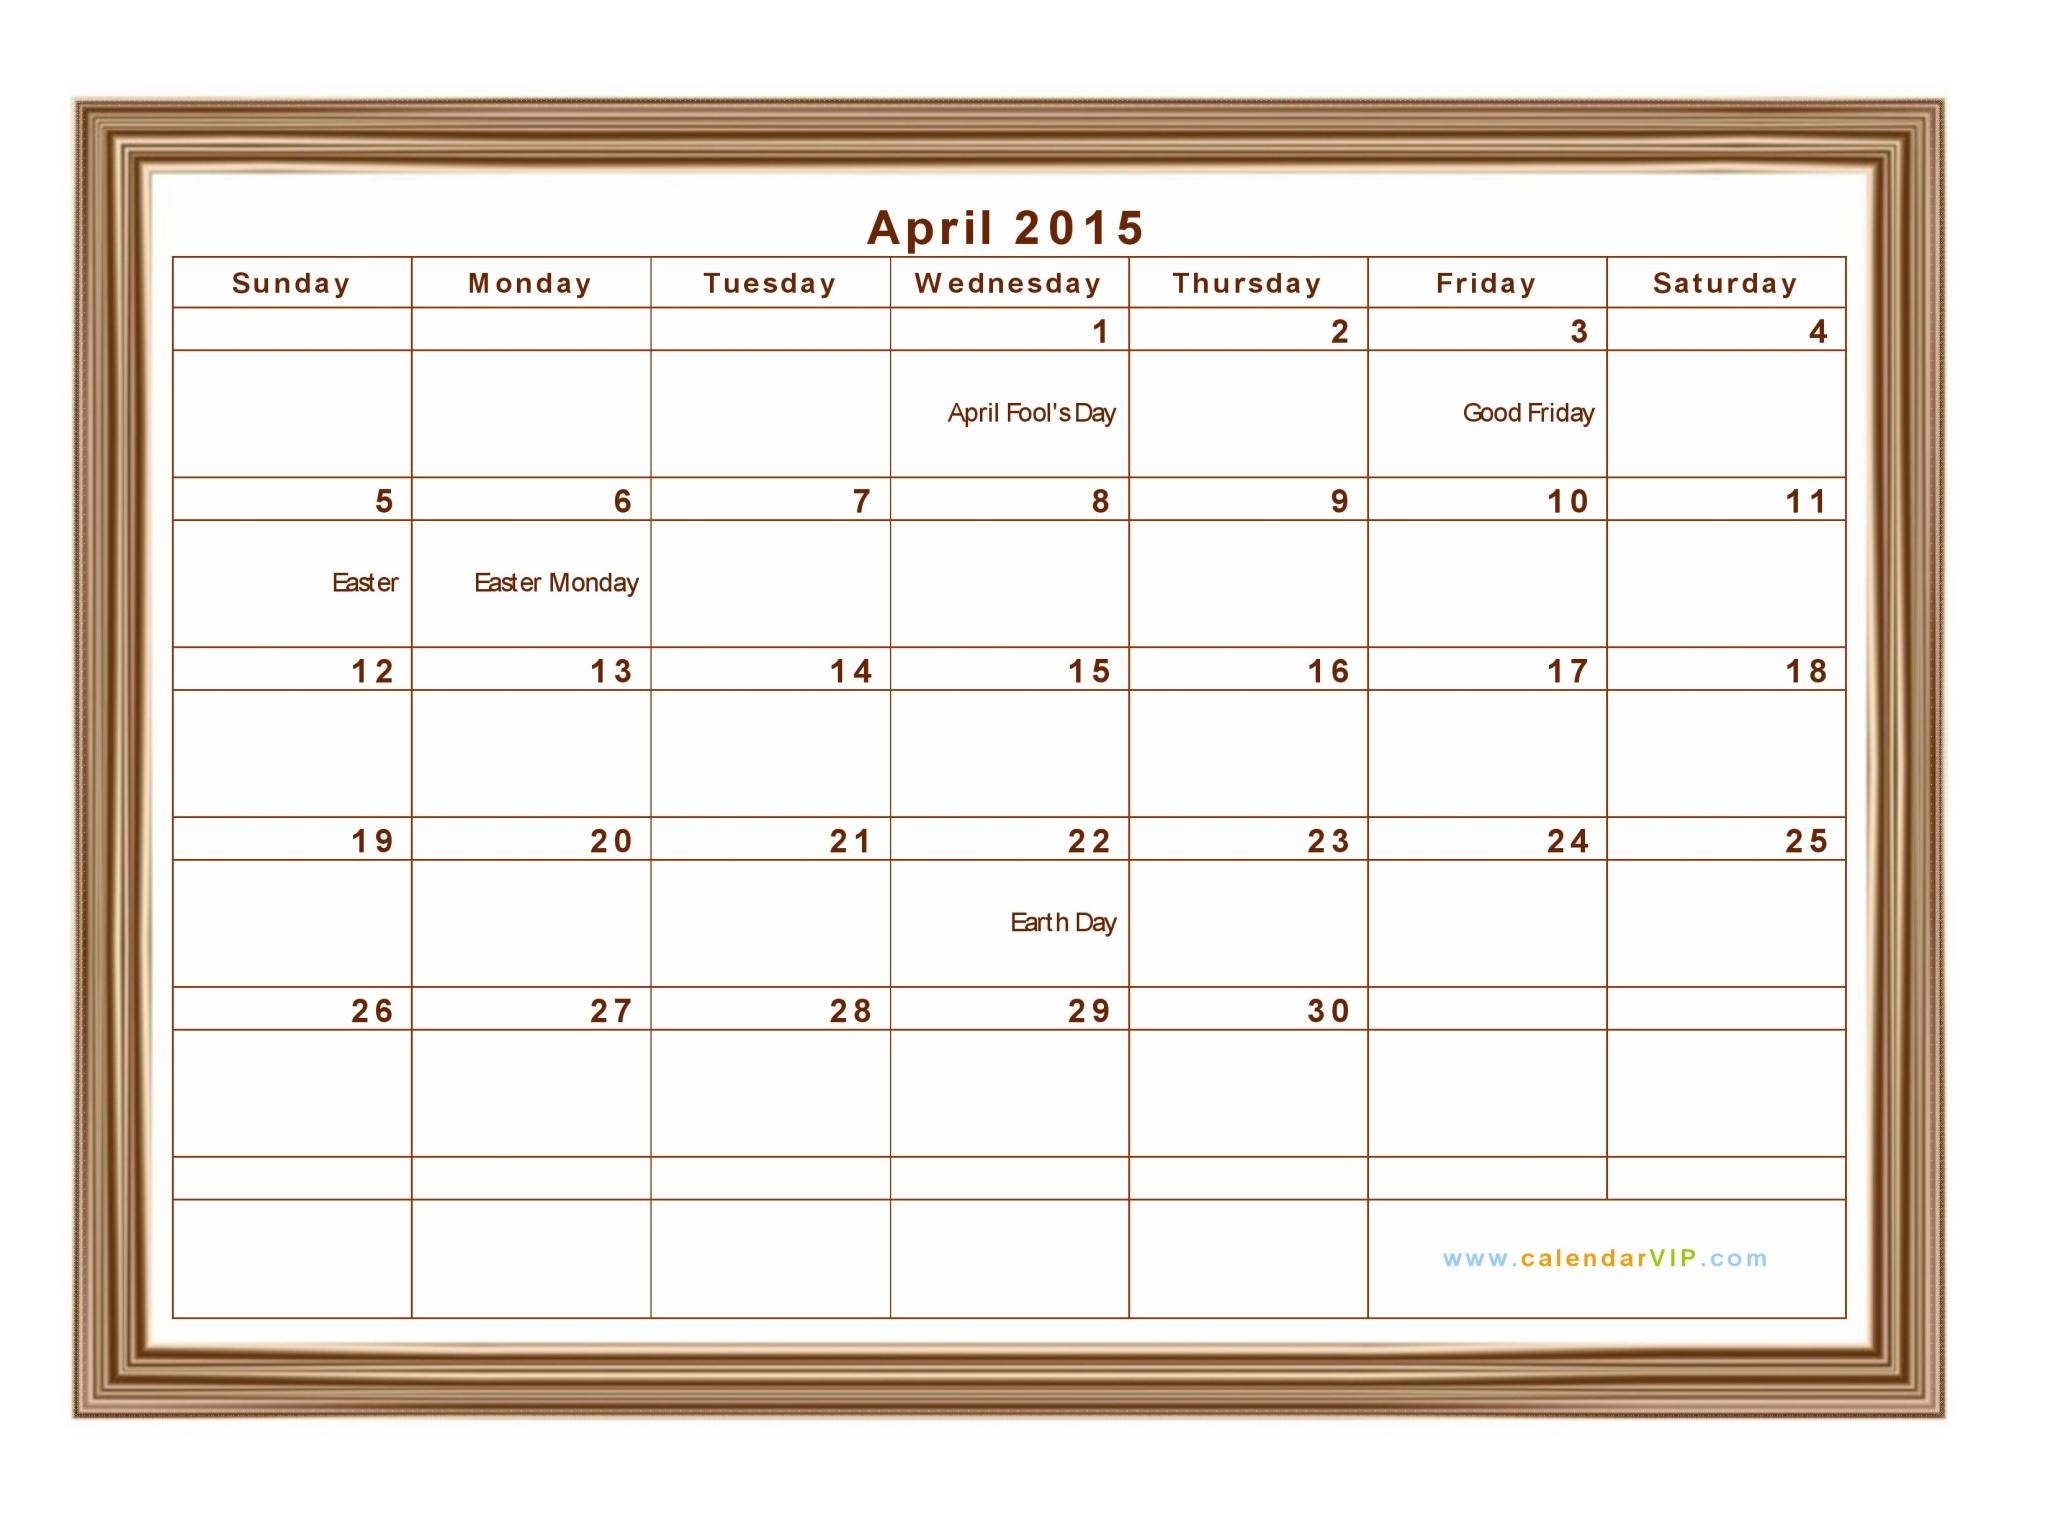 Kalender Oktober 2015 Kalender Ausdrucken Com Pictures to pin on ...